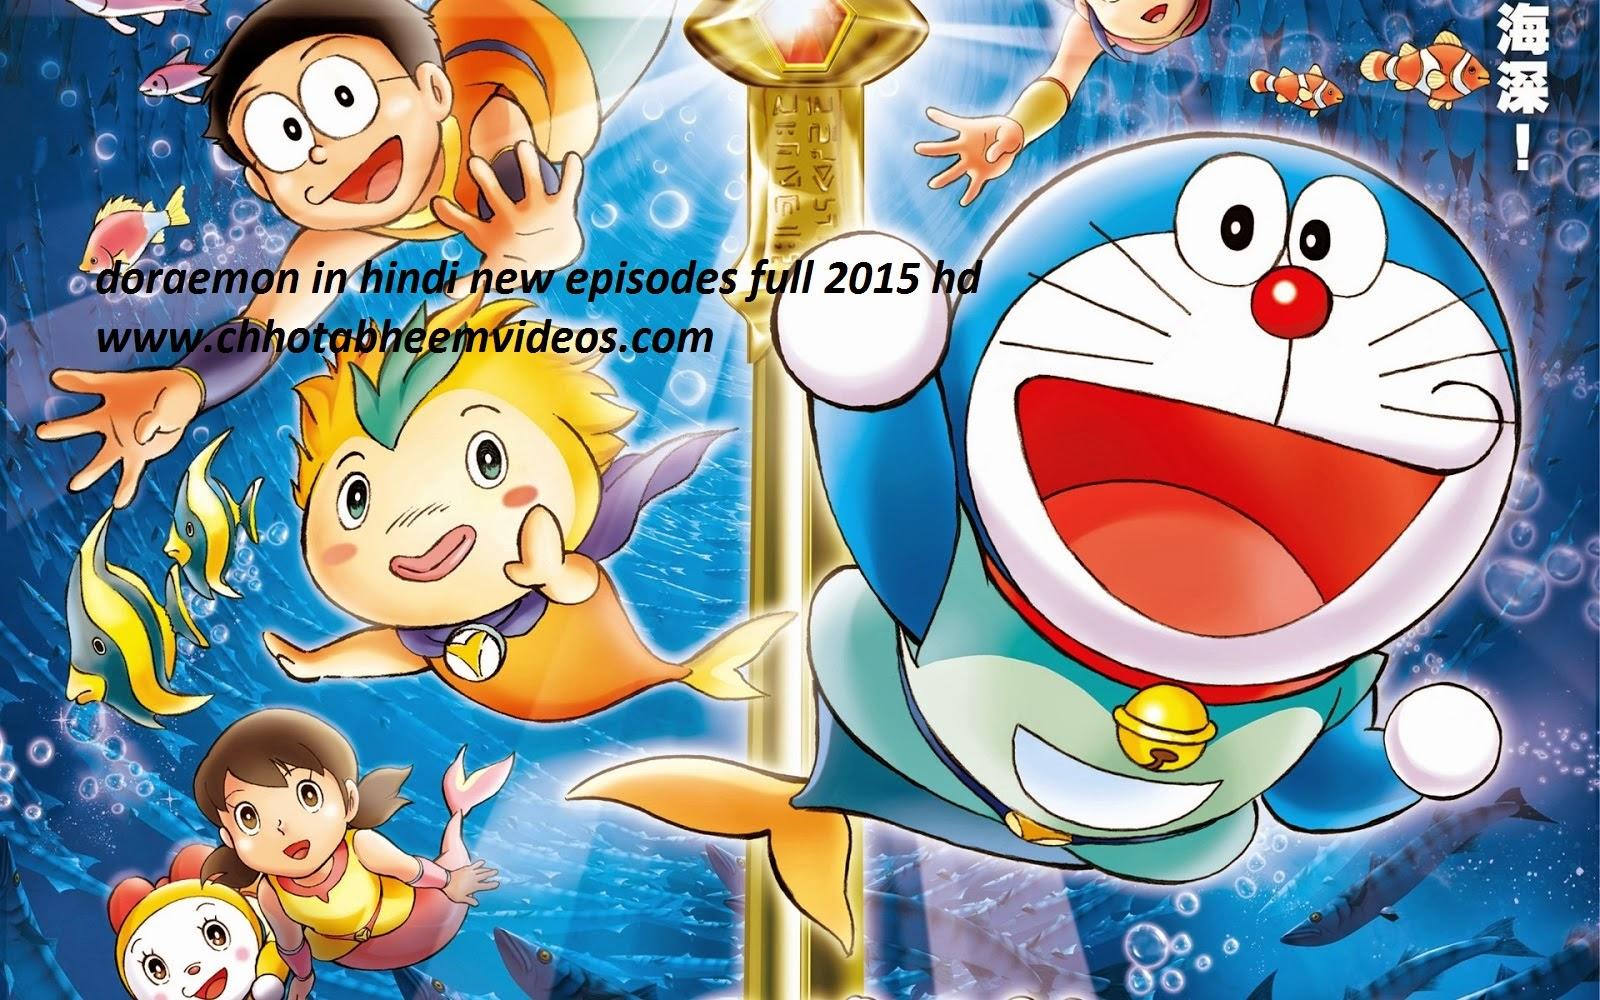 Doraemon picture in hindi wallpaper images for Doraemon new games